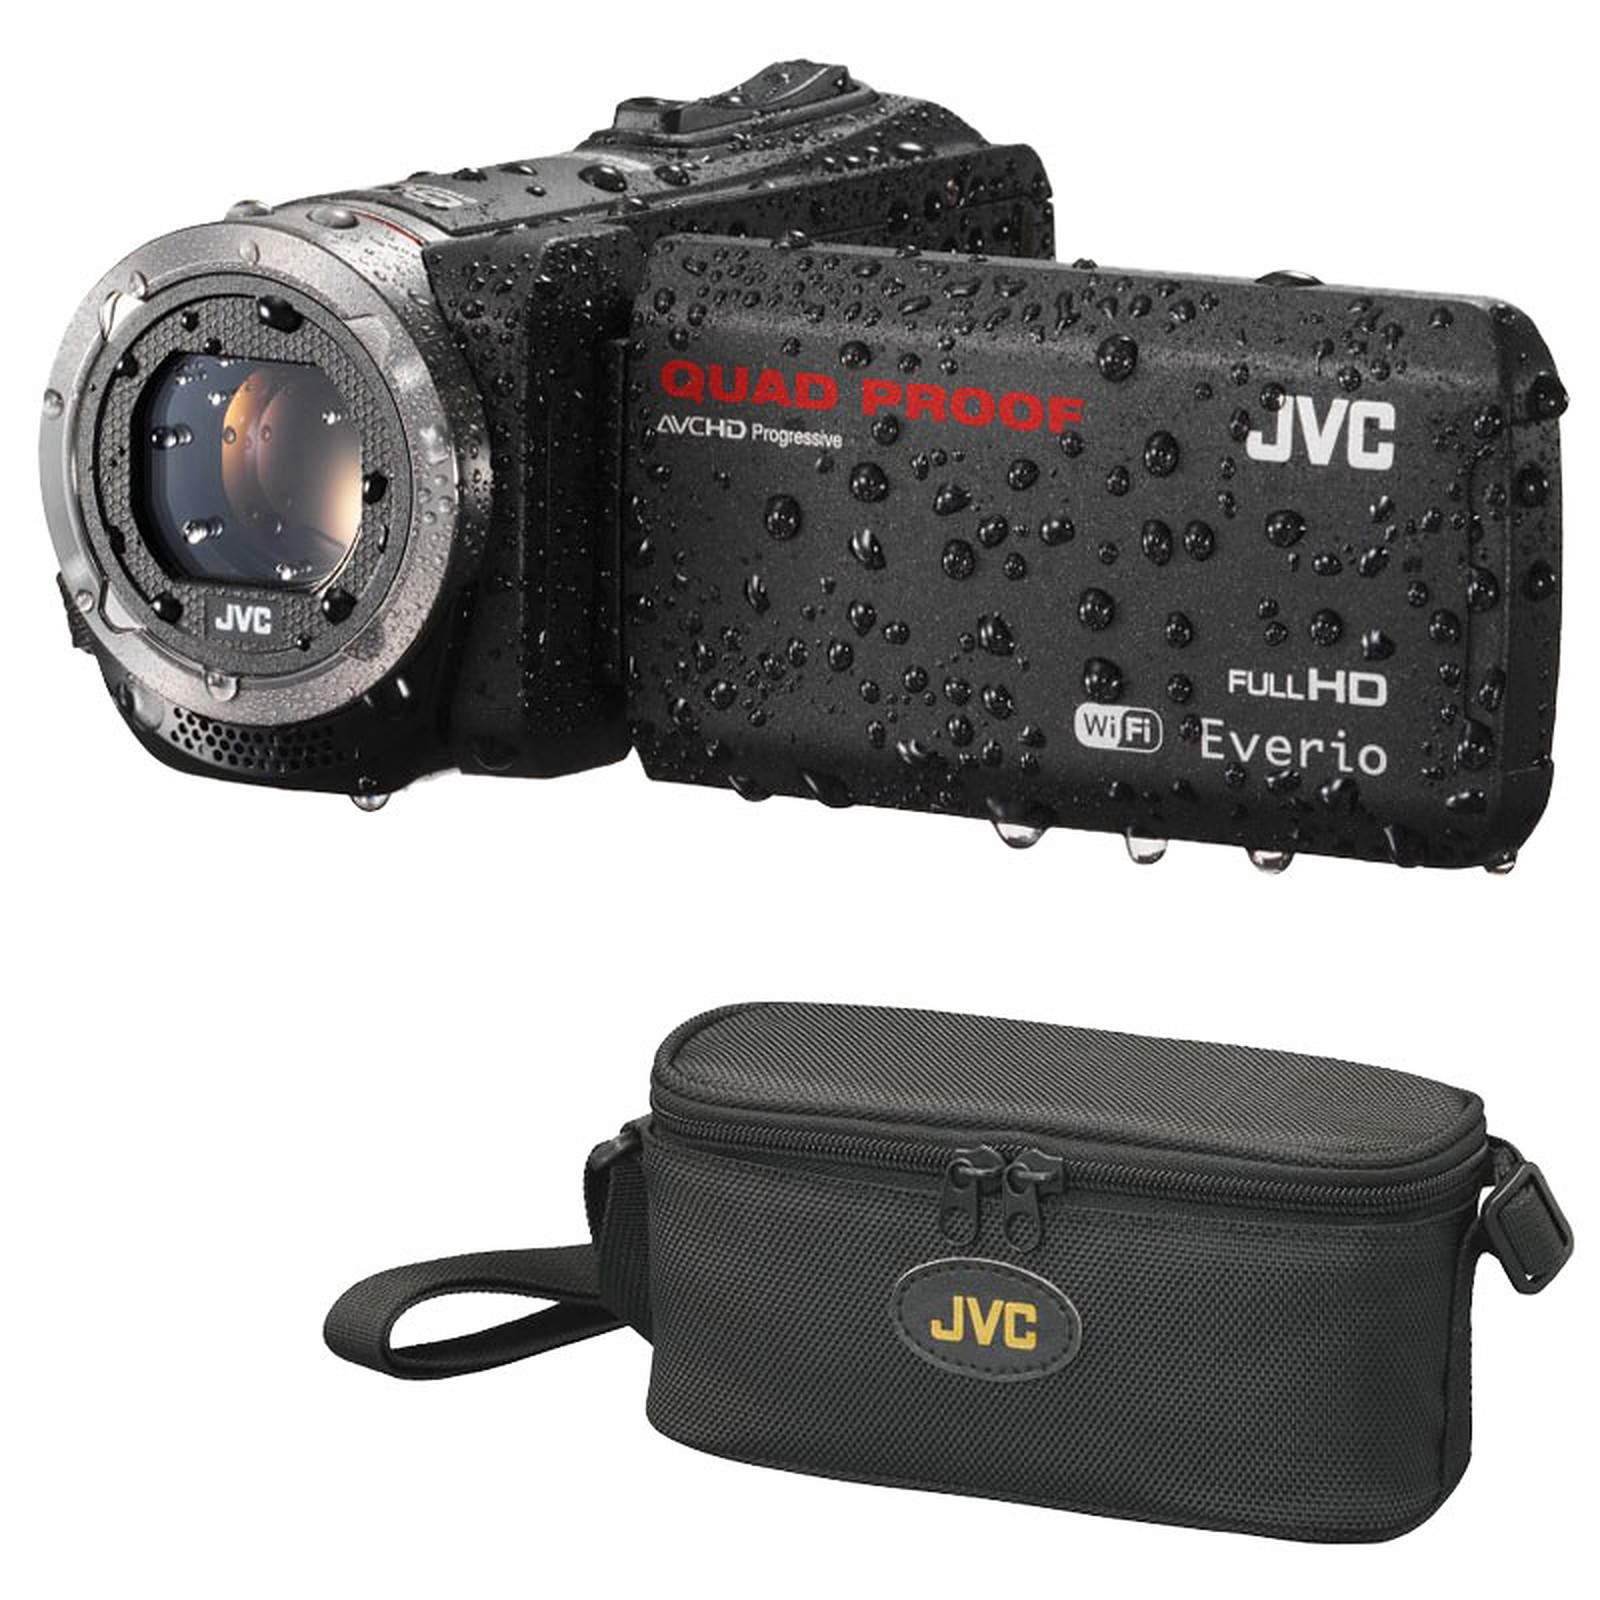 JVC GZ-RX515 Noir + JVC CB-VM89 + Carte SD 8 Go